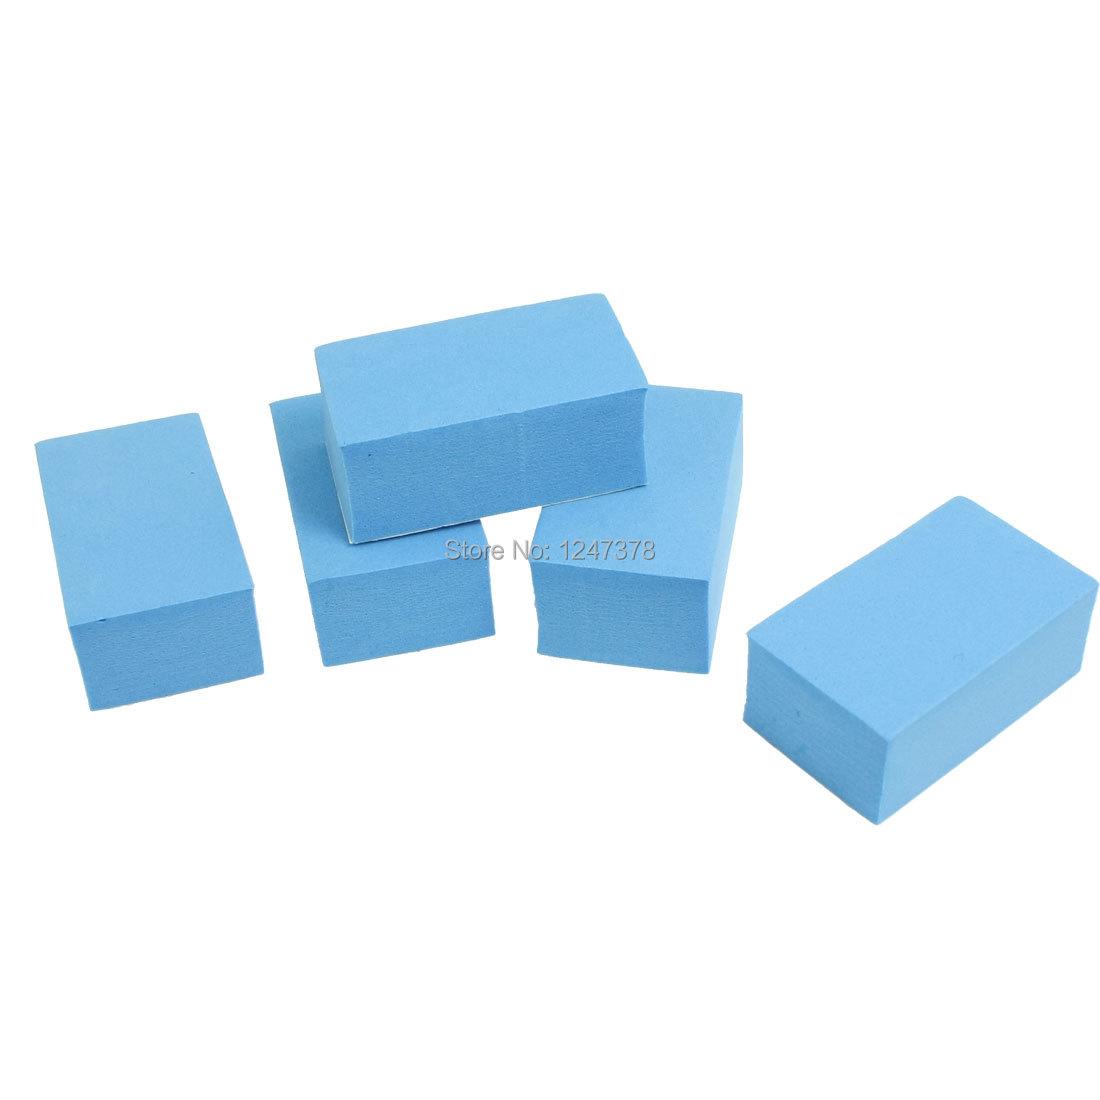 48mm x 27mm x 20mm (L*W*T) 5 Pcs/lot Foam Adhesive Car Truck Door Edge Guard Bumper Protector Decor Blue(China (Mainland))